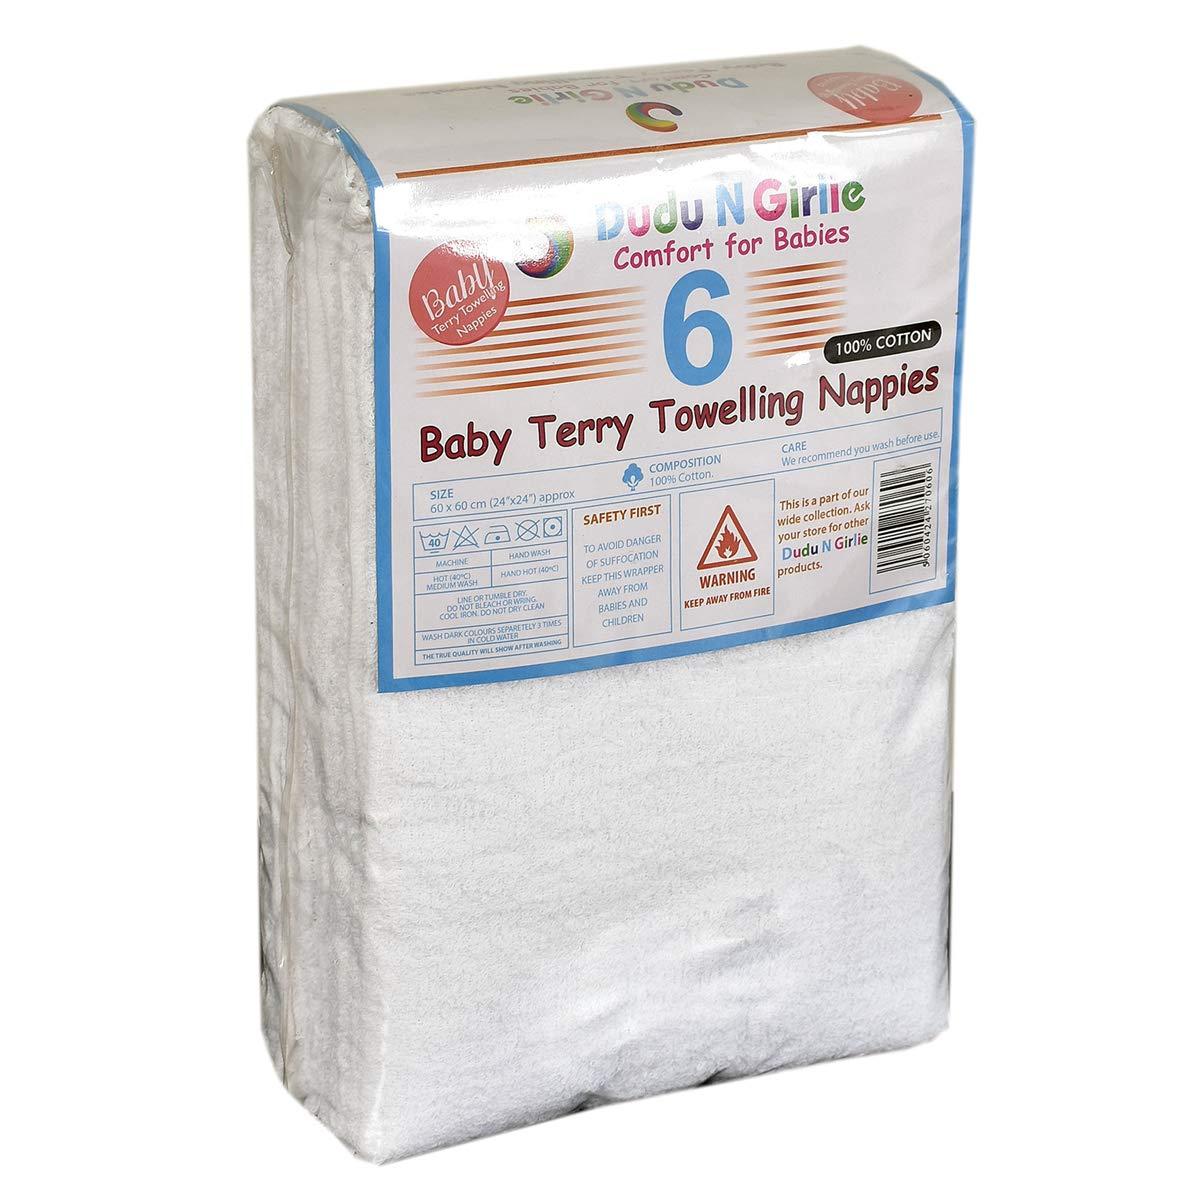 Dudu N Girlie Terry 6 unidades Pa/ñales de algod/ón para beb/é